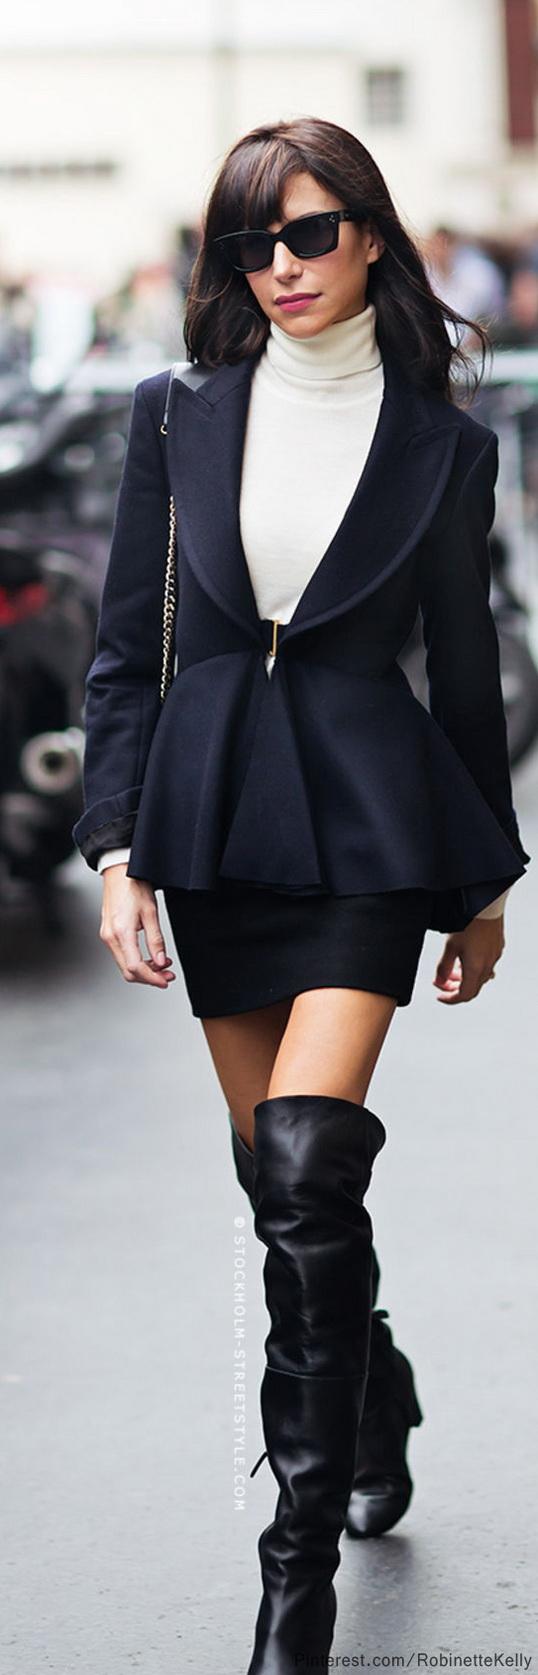 blog-photos-sexy-cuissardes-147